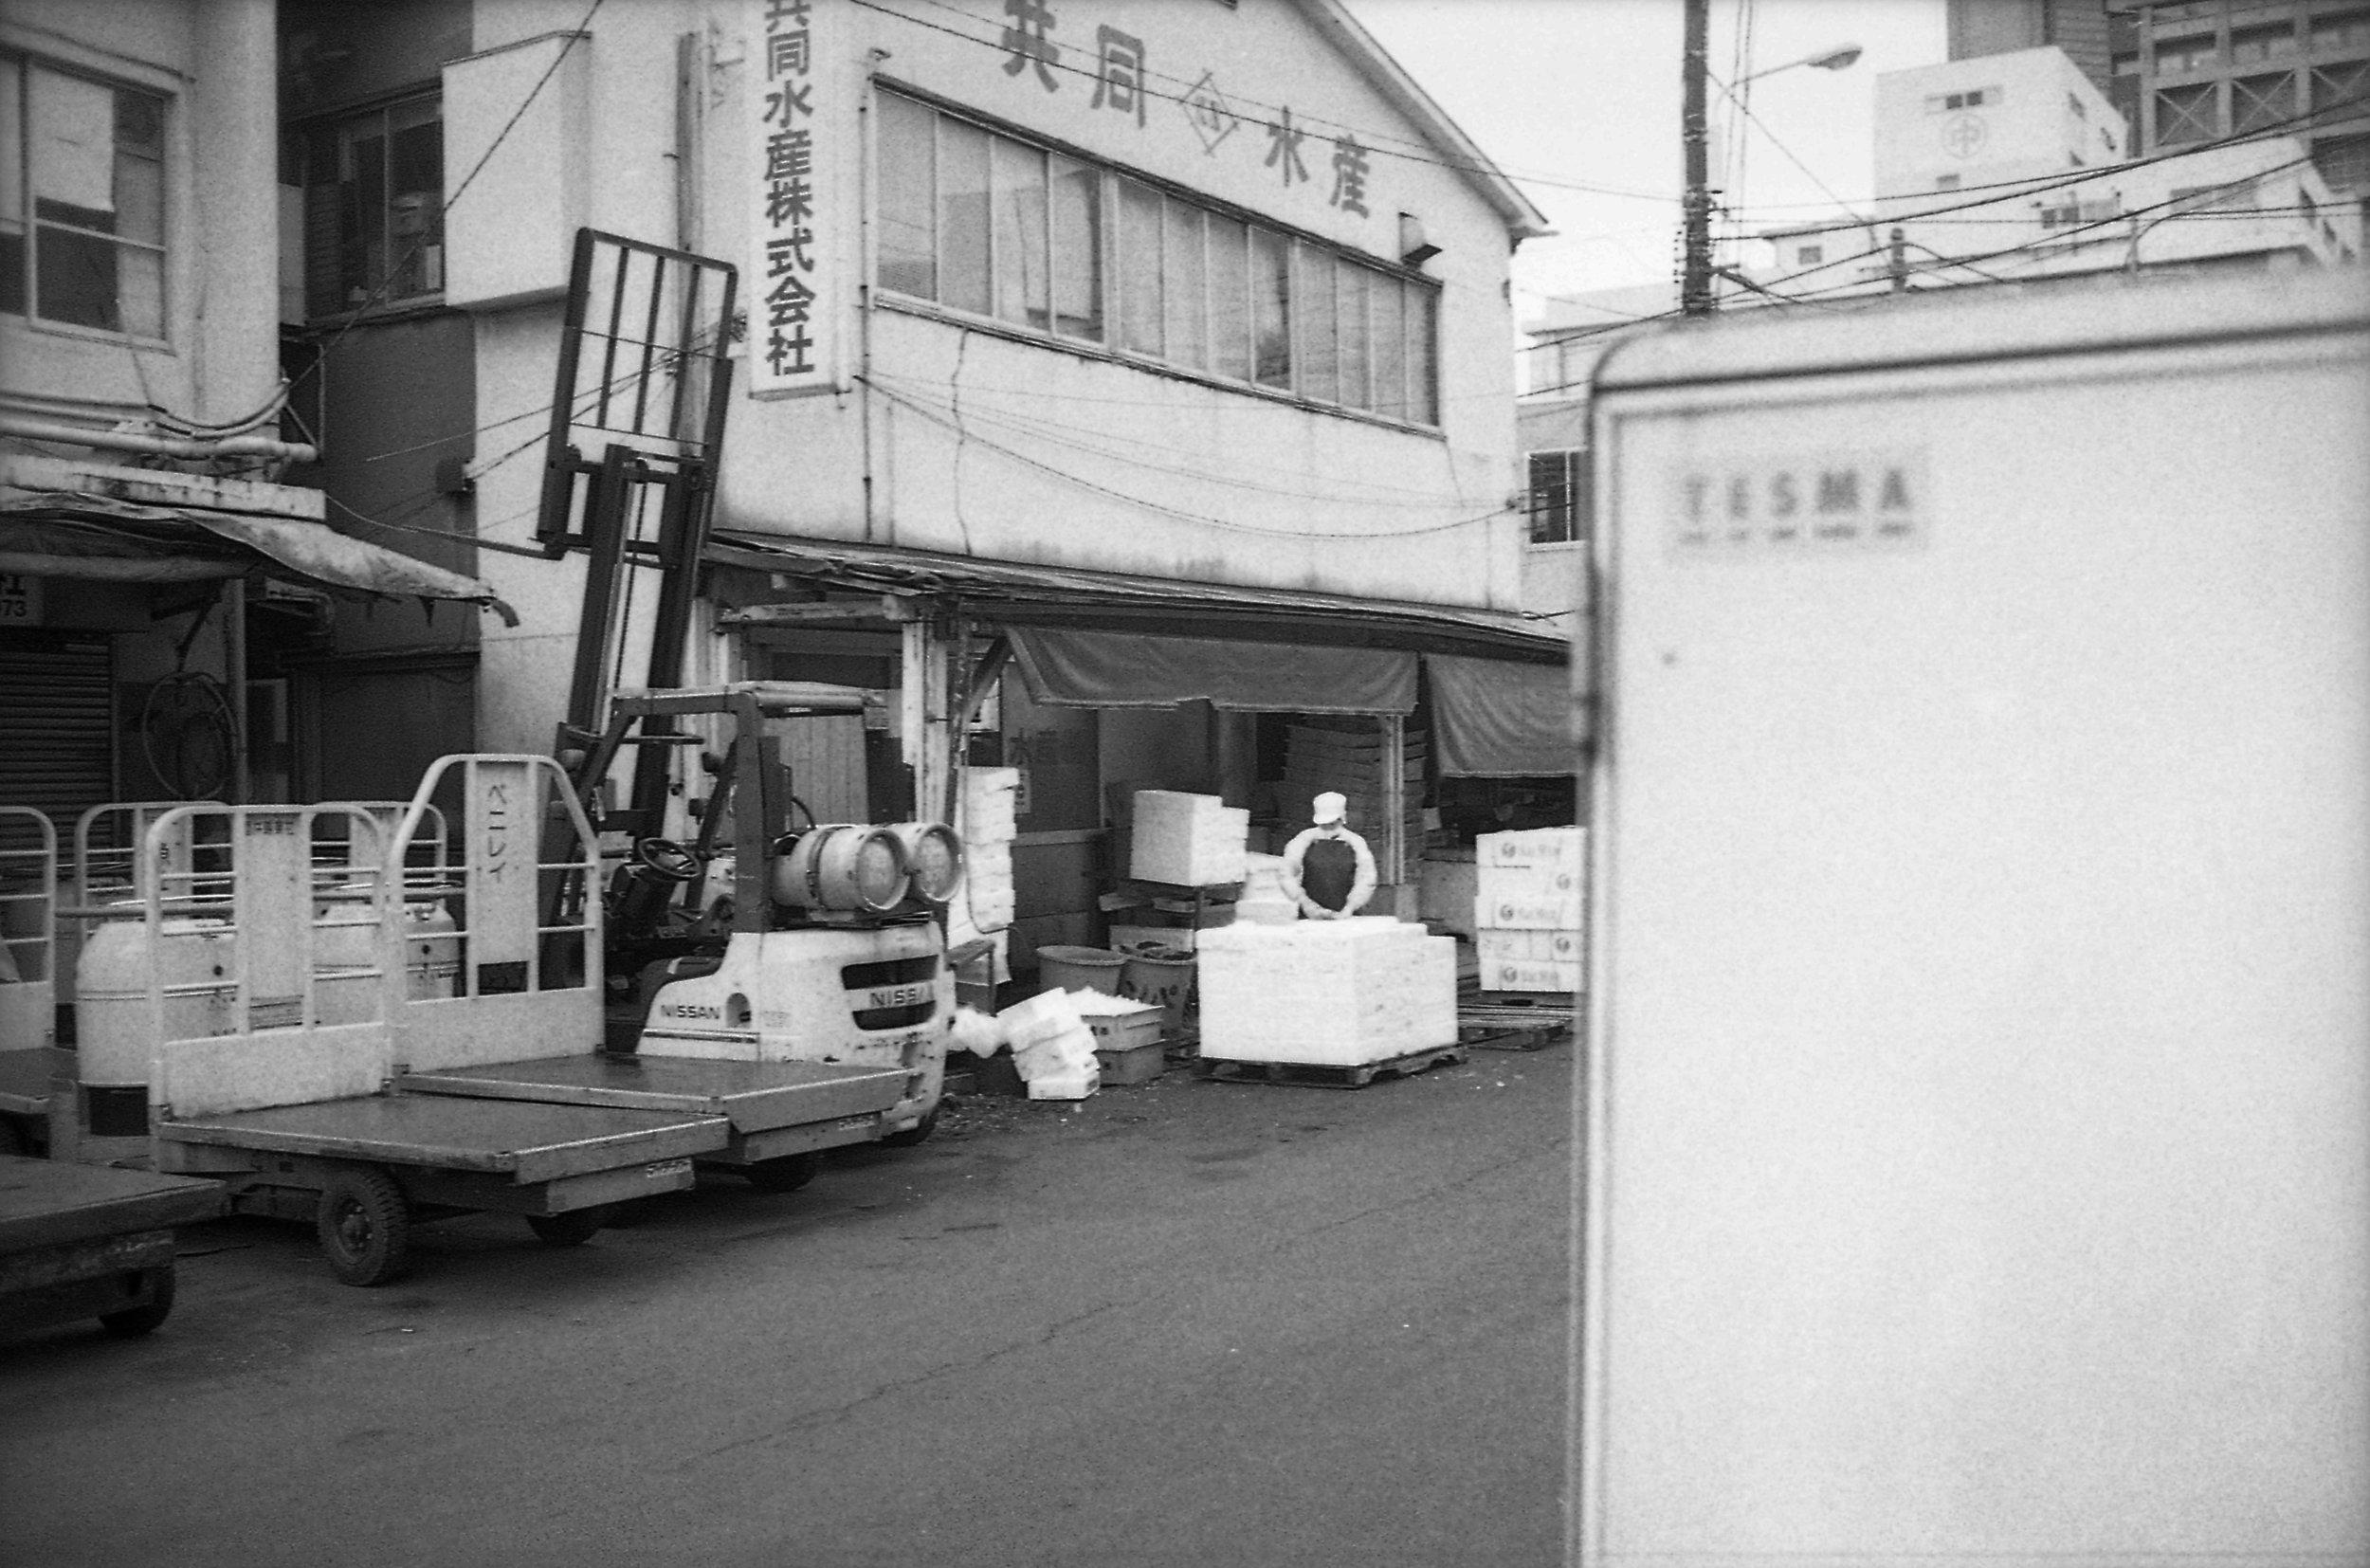 20180827_29_Hiroshima_022.jpg